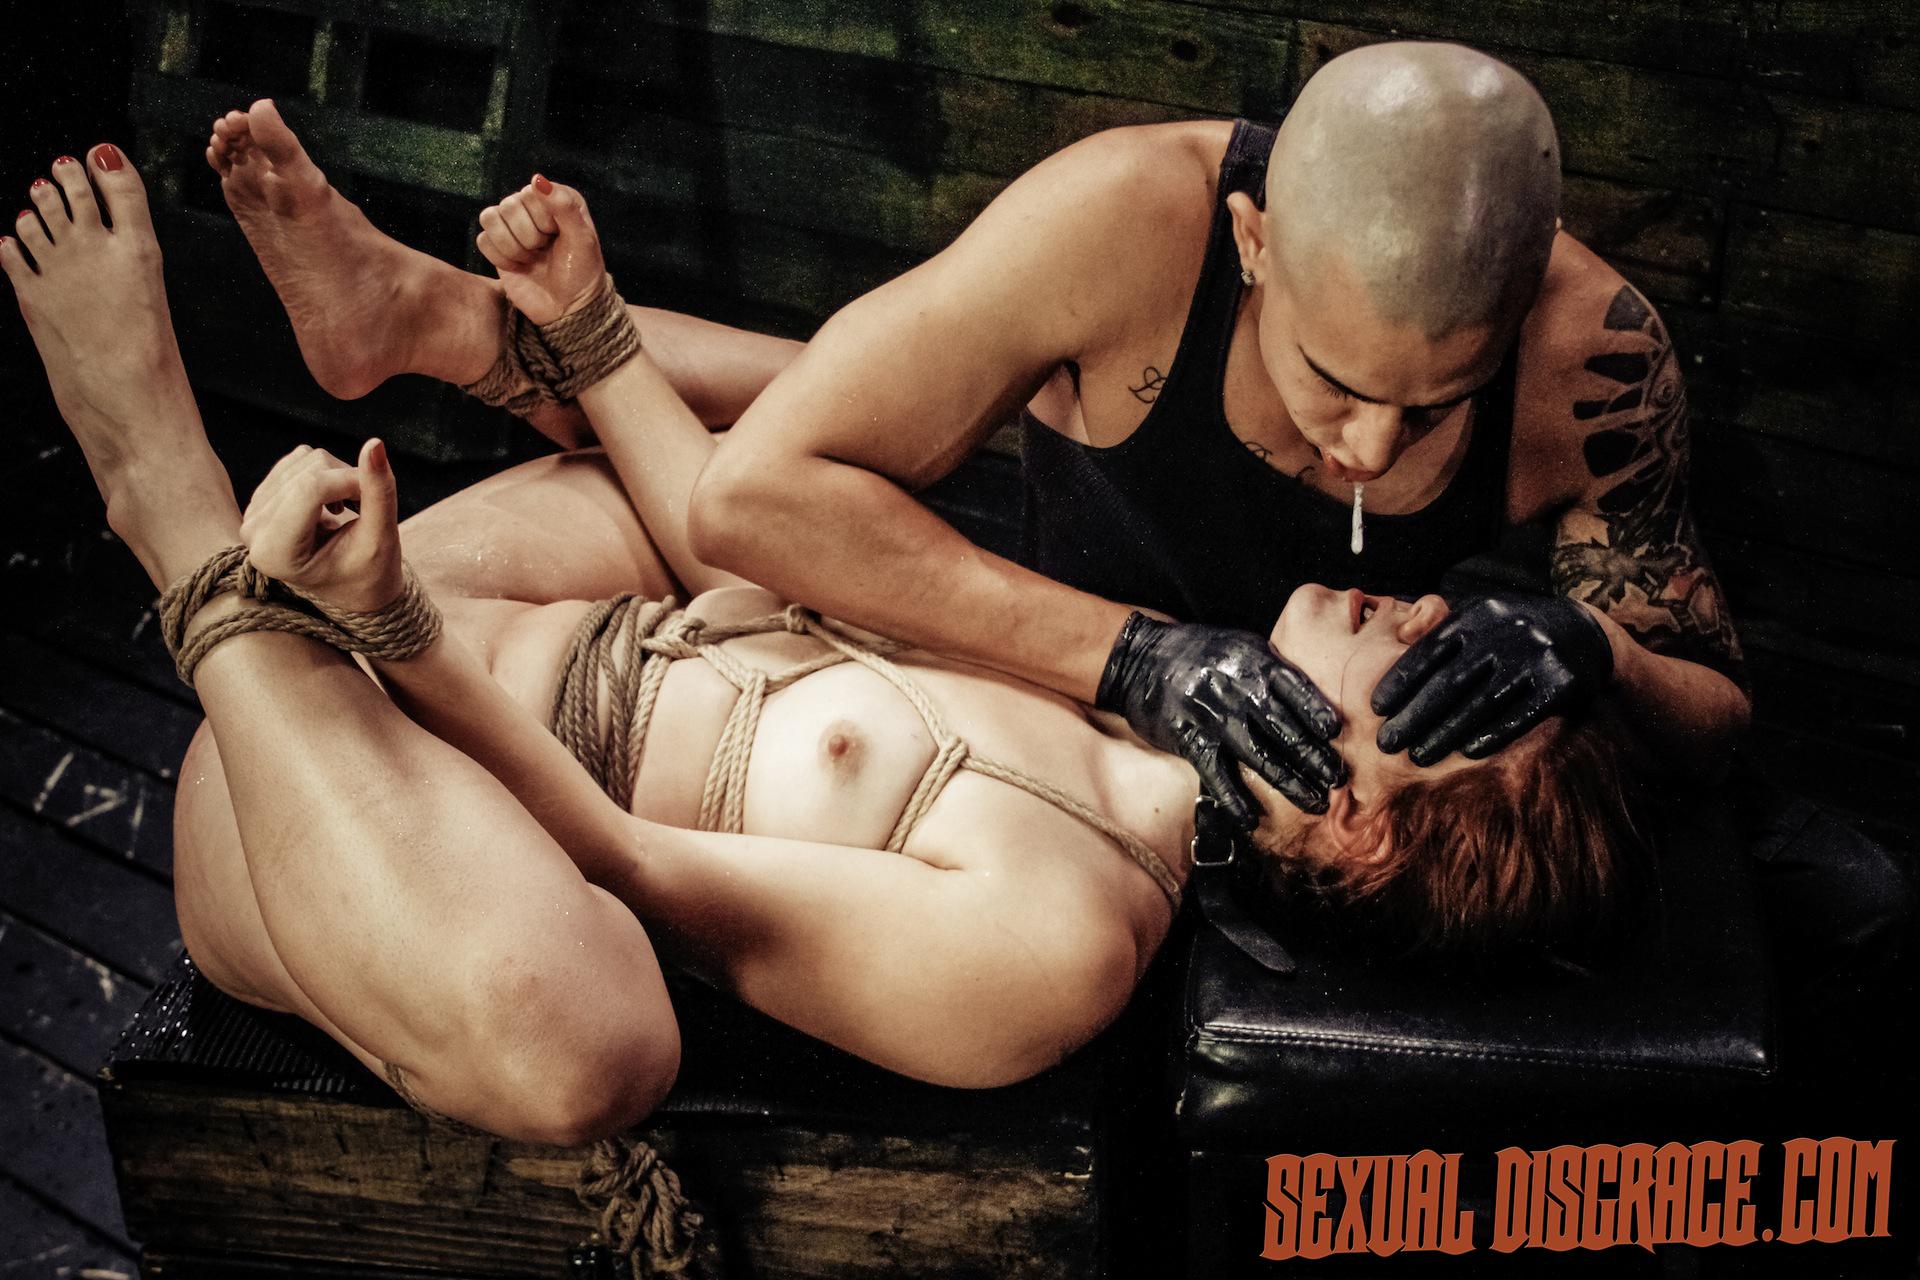 Rose Crimson Tyrell Suffers Strap Restrain Bondage, Fellate Bj, Raunchy Ass-fuck Lovemaking, Sybian Saddle, Splattering